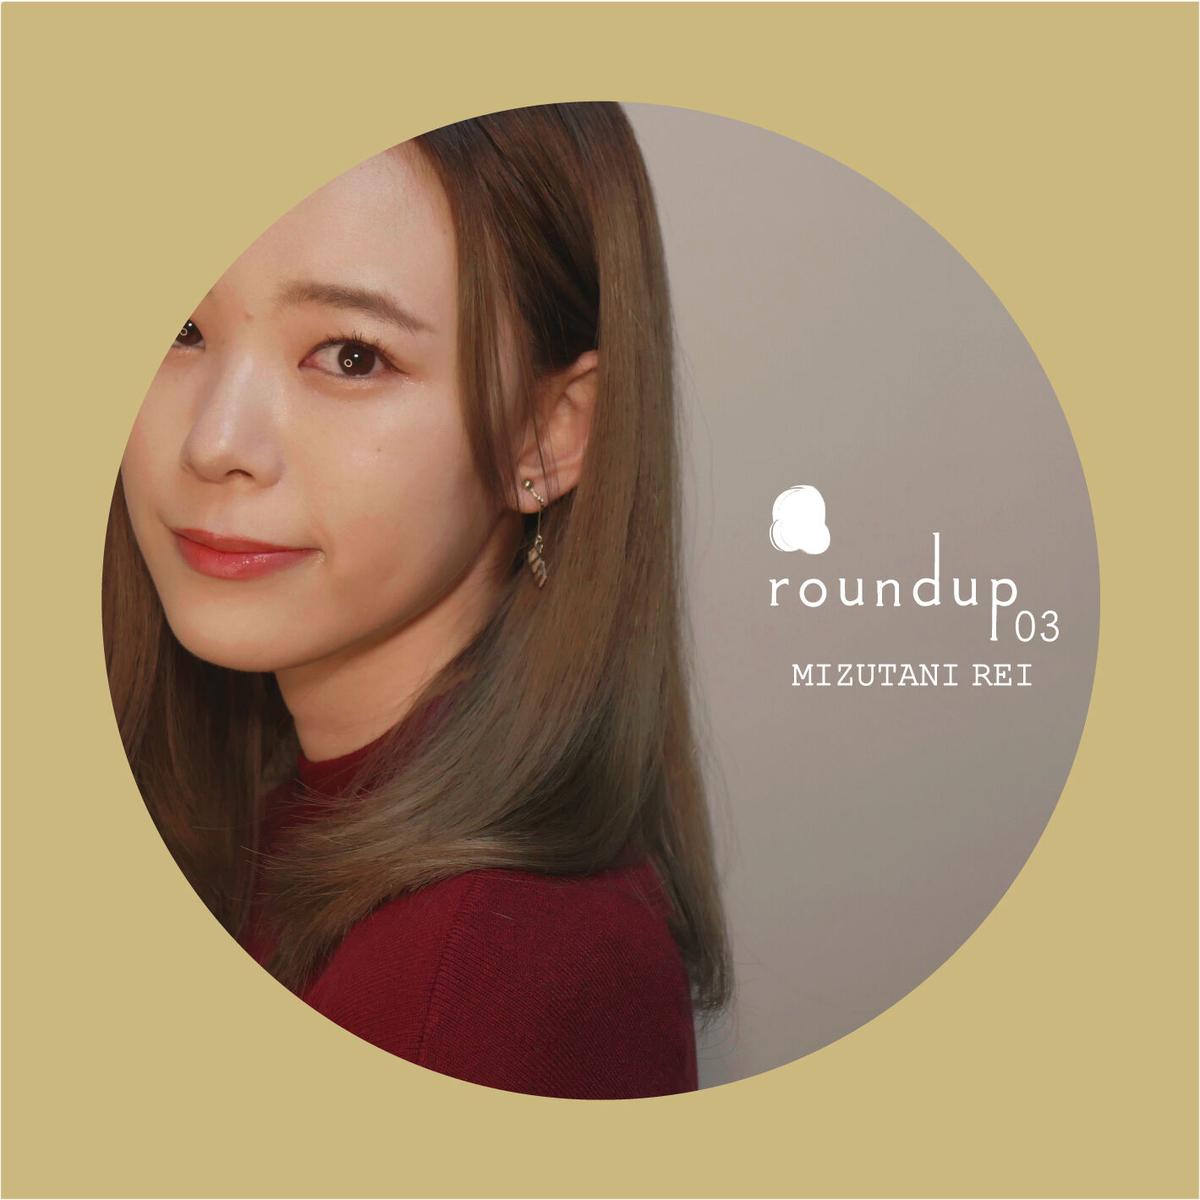 f:id:kyon-rog:20201226205214j:plain